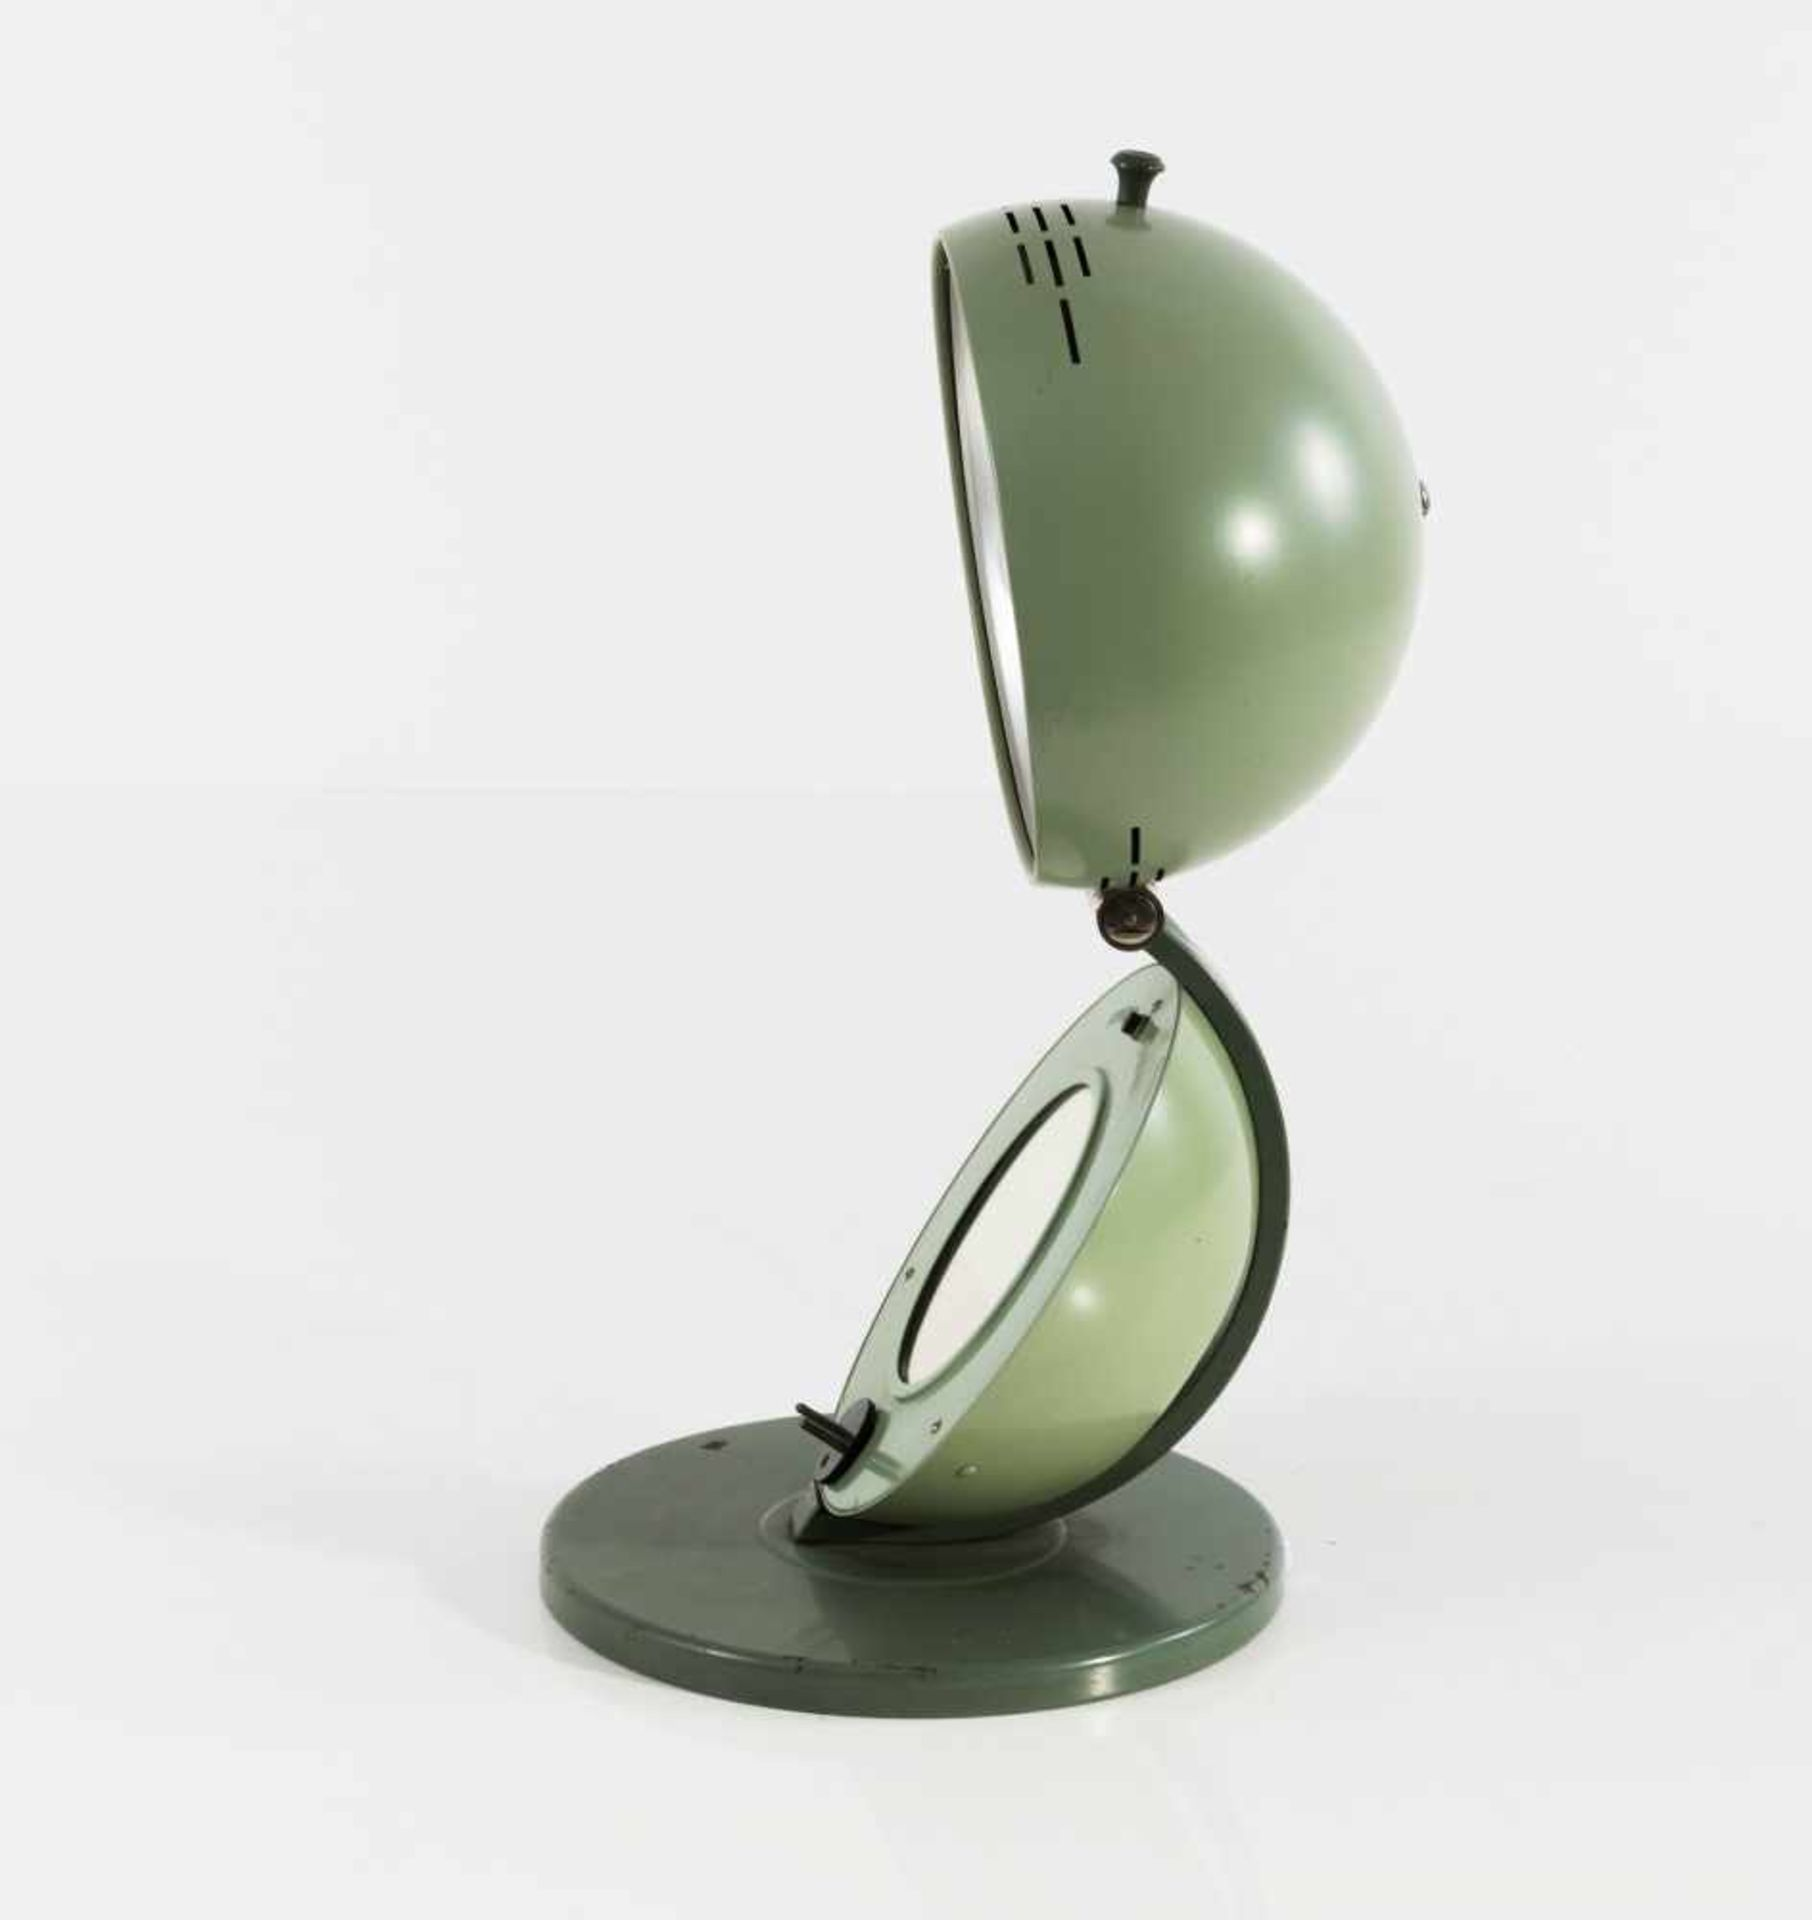 Los 46 - Quarzlampen Gesellschaft M.B.H., Hanau Höhensonne 'S100', 1930/40er Jahre H. 46,5 cm (